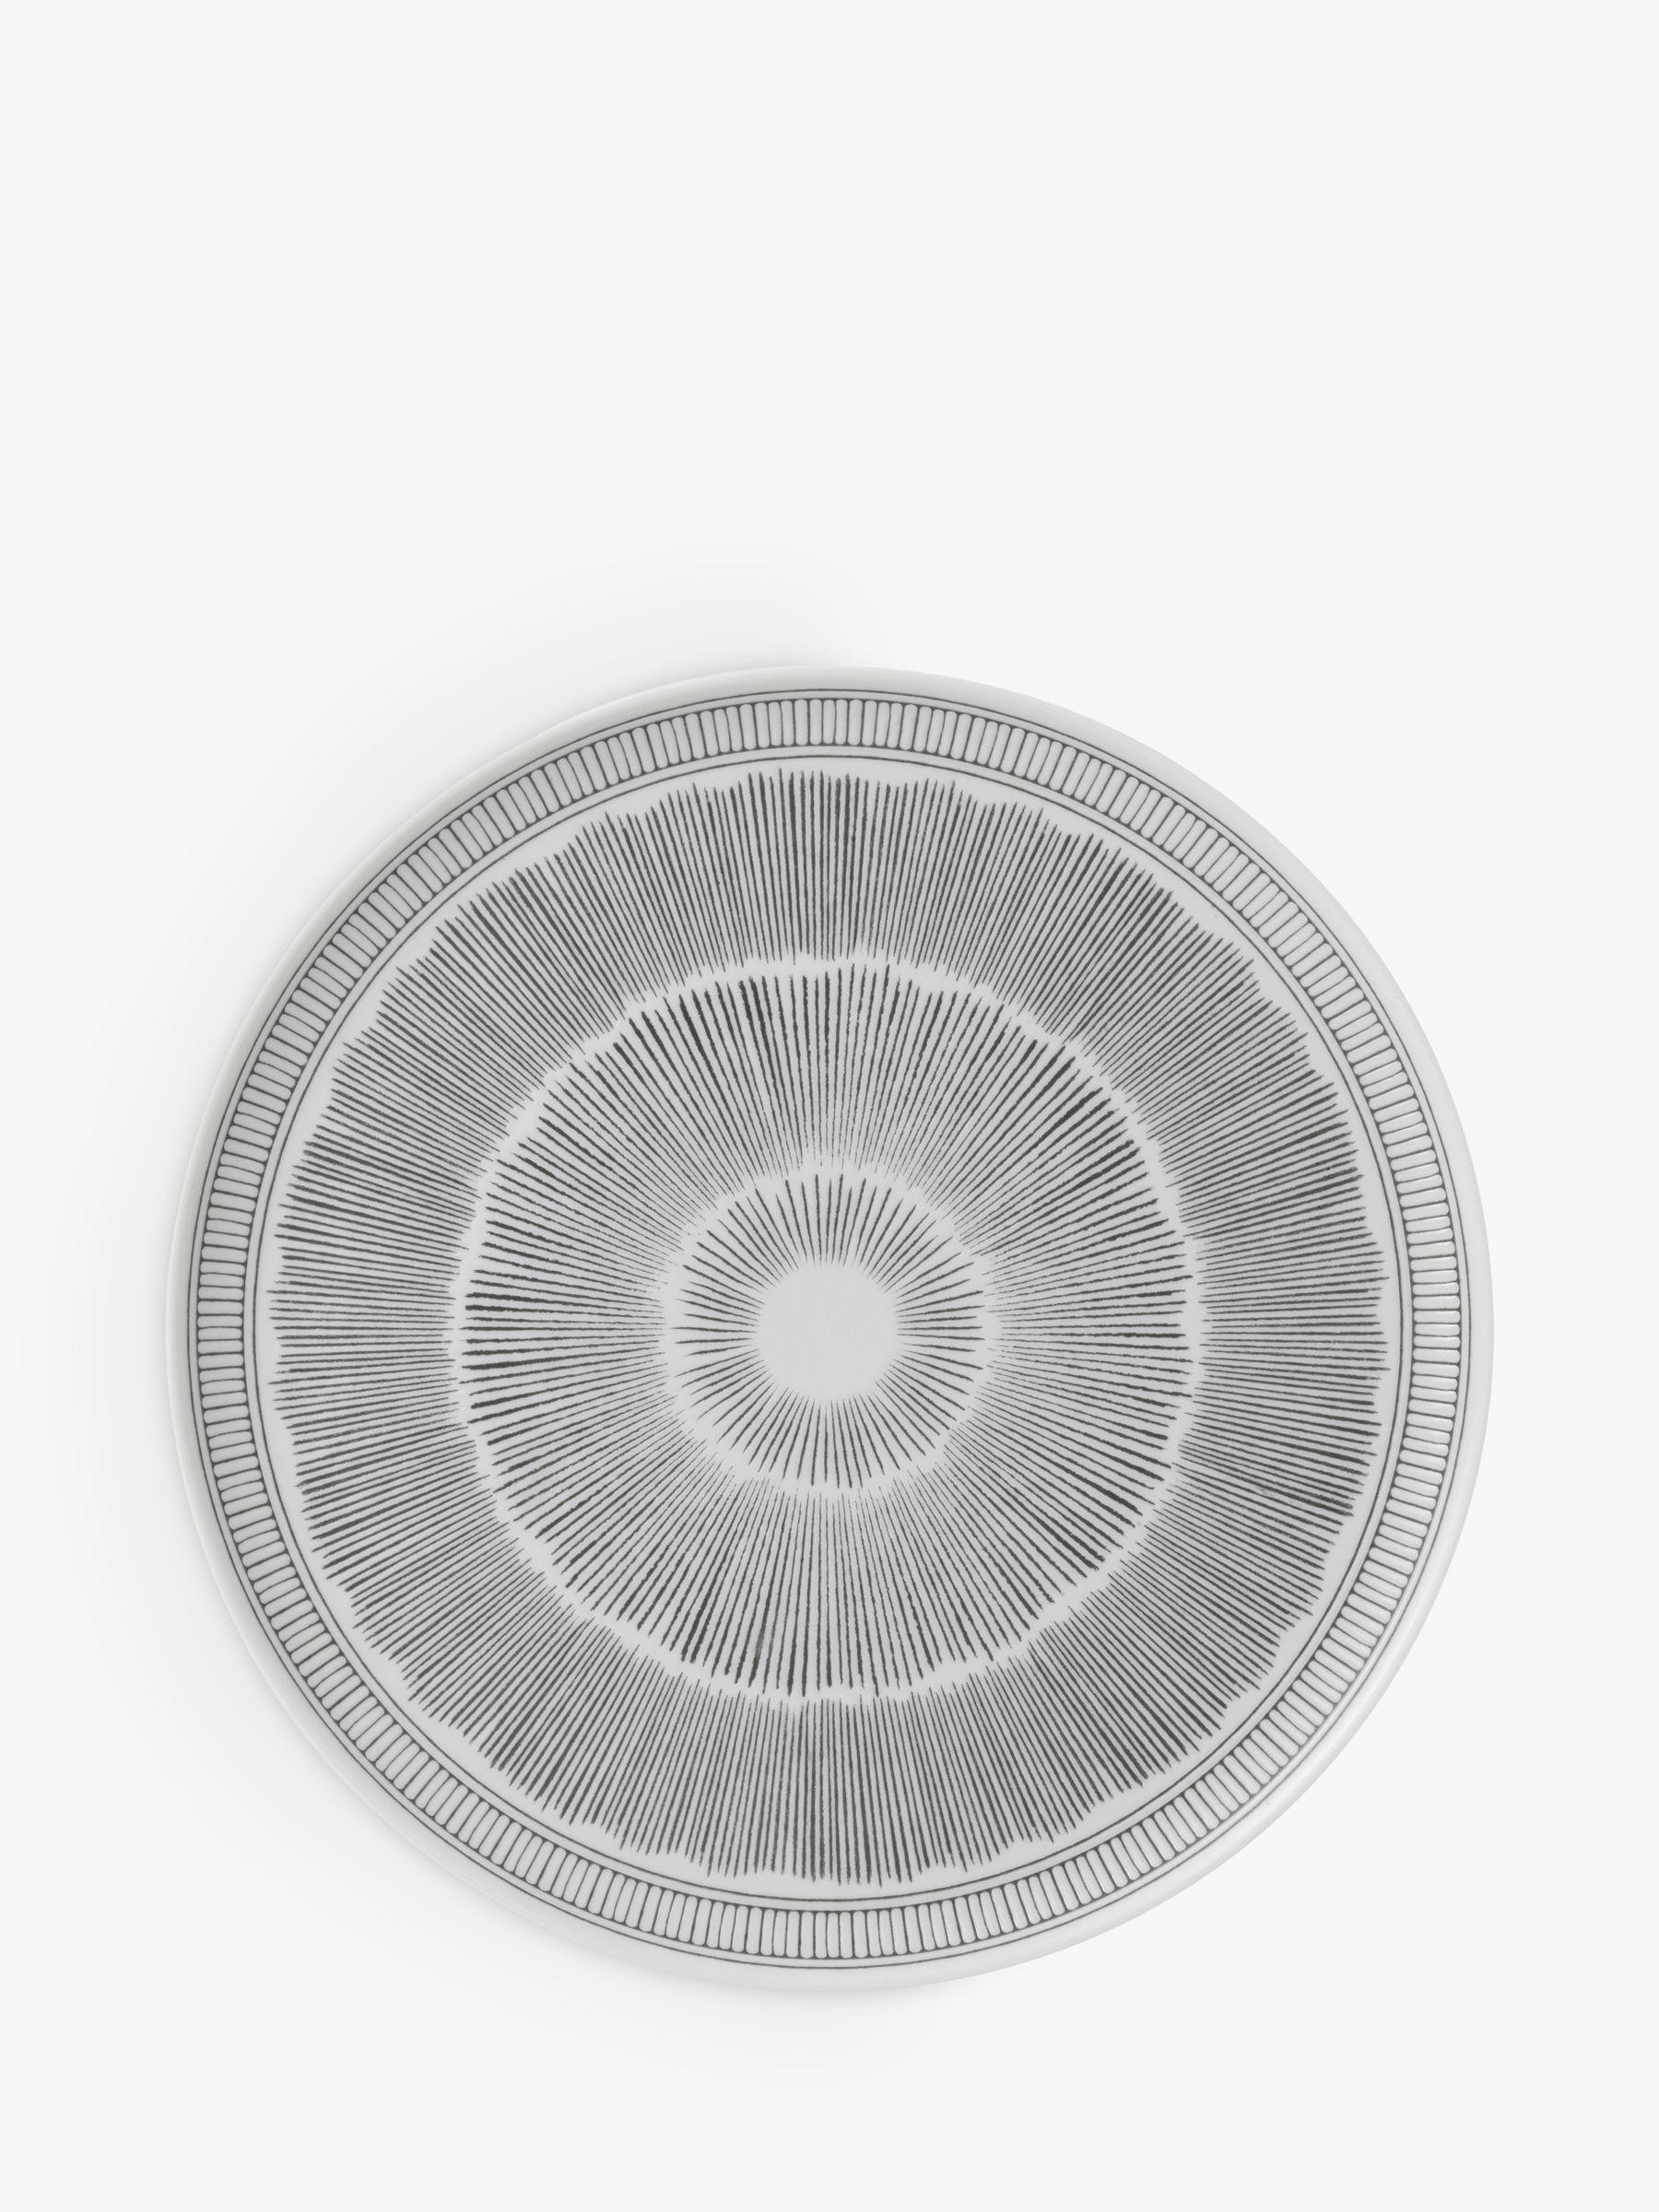 Royal Doulton ED Ellen DeGeneres for Royal Doulton Grey Line 32cm Platter